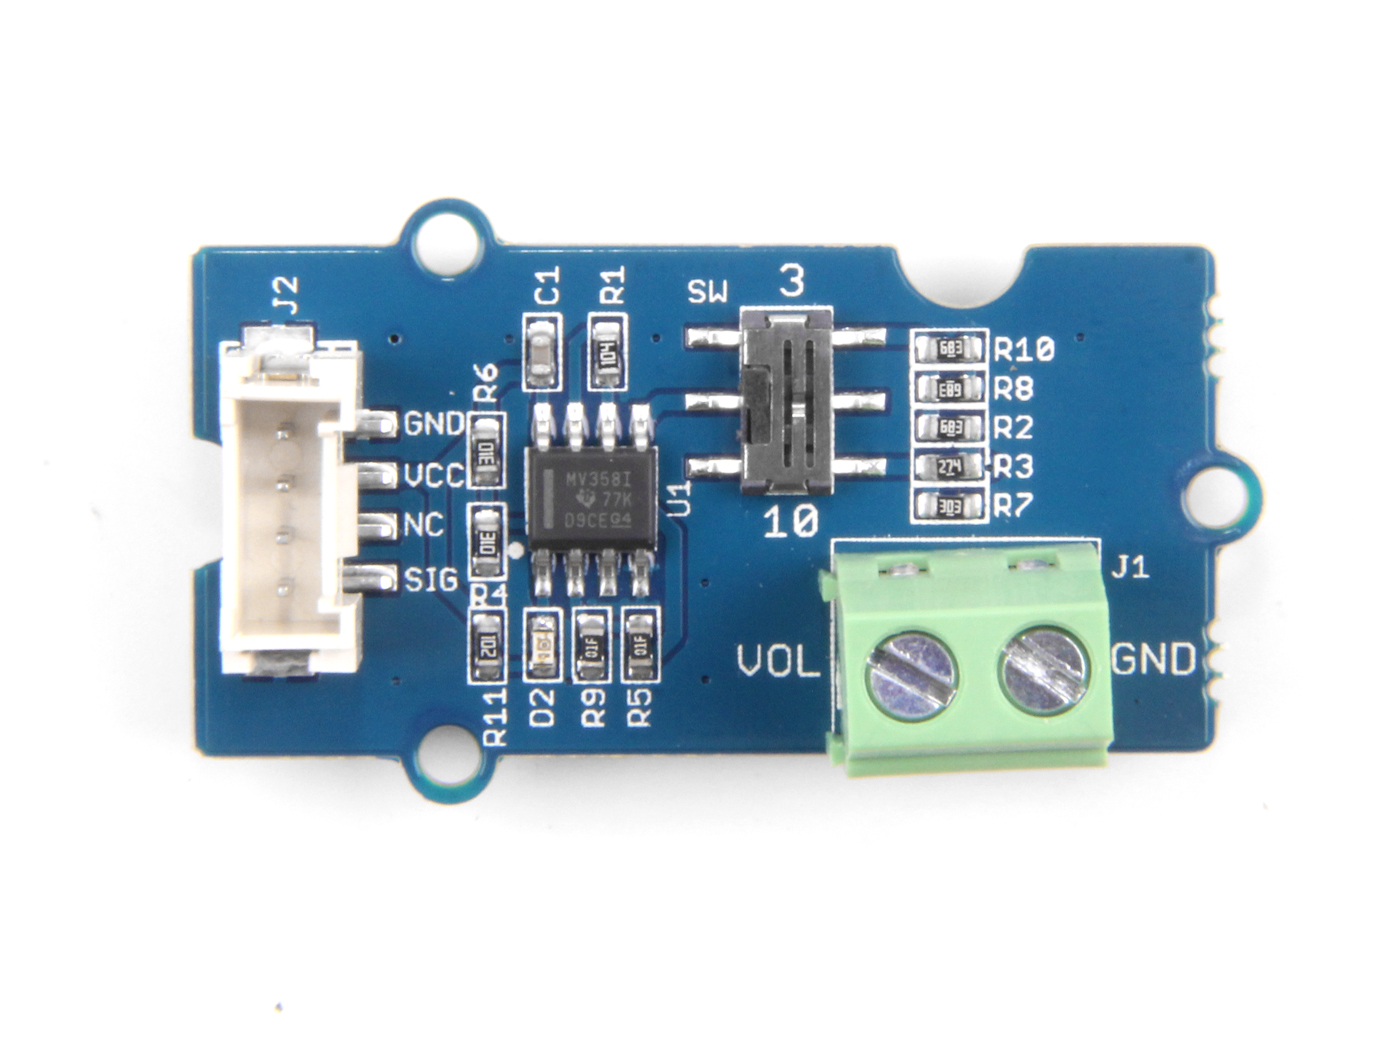 Grove Voltage Divider Sensor Seeed Studio Circuit Dividers